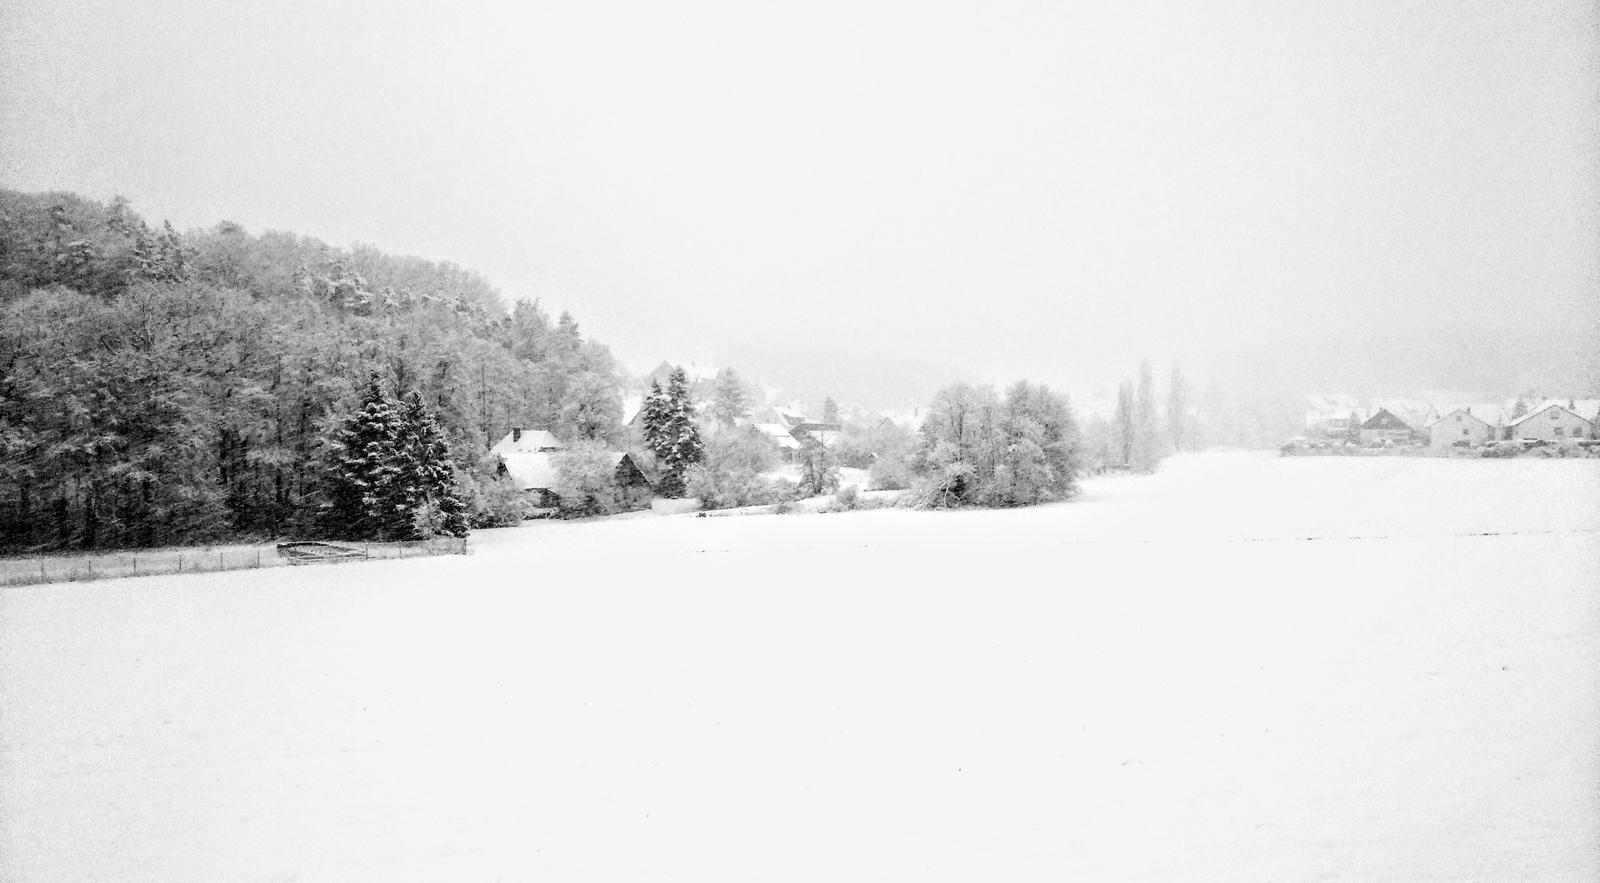 winter again by Mittelfranke